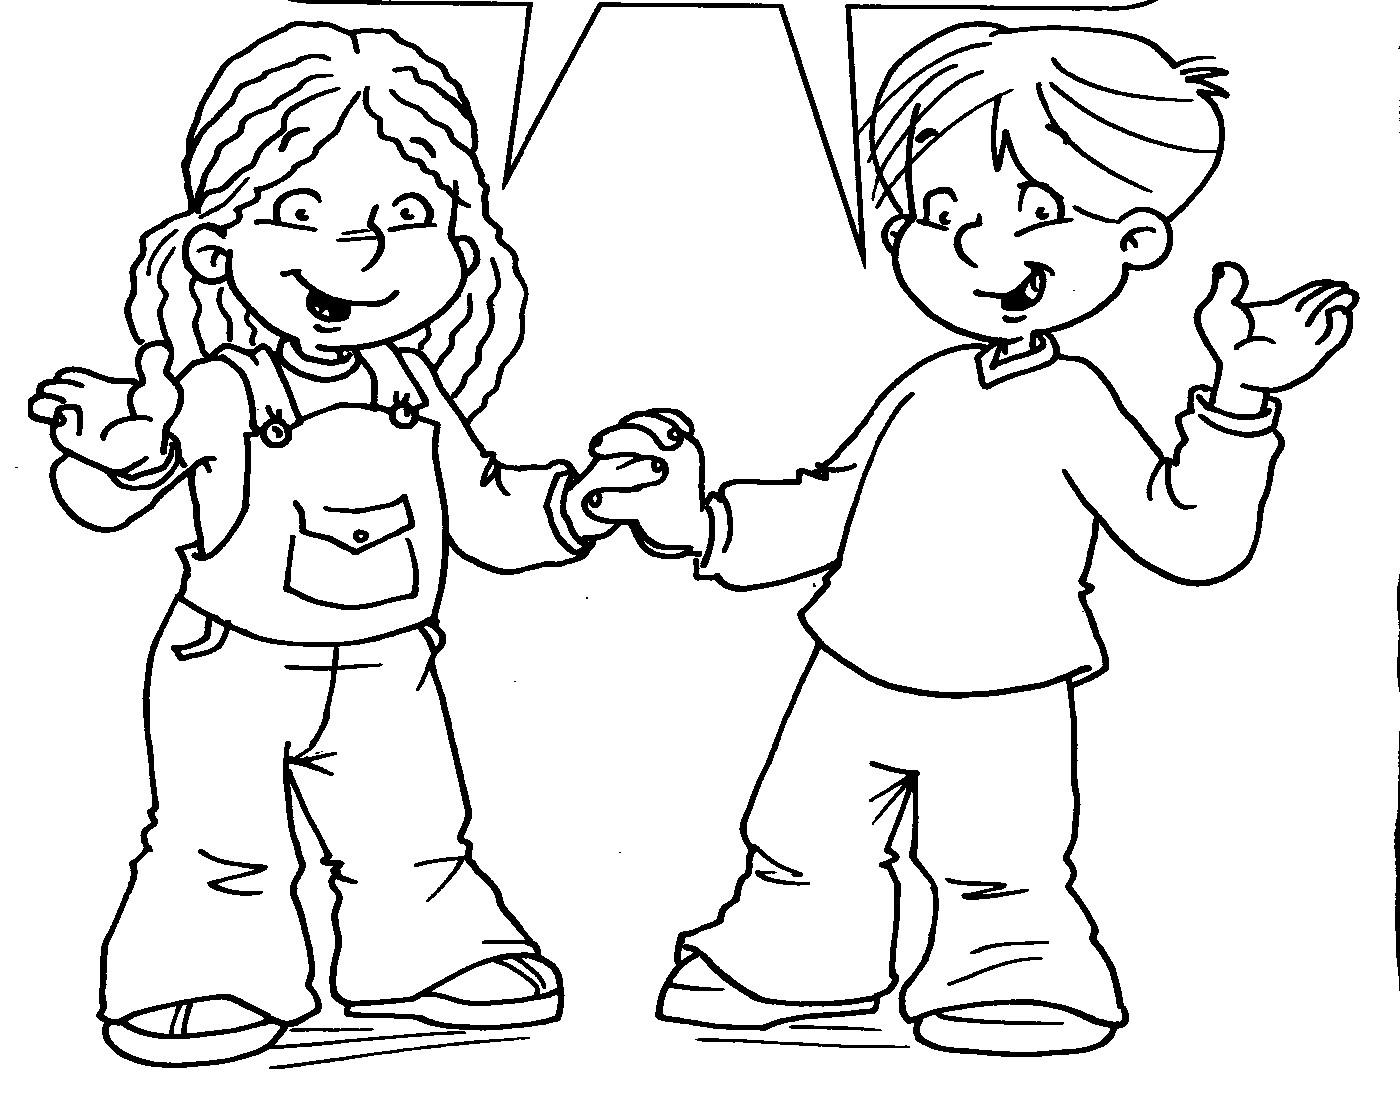 Dibujo Para Colorear De Convivencia Escolar